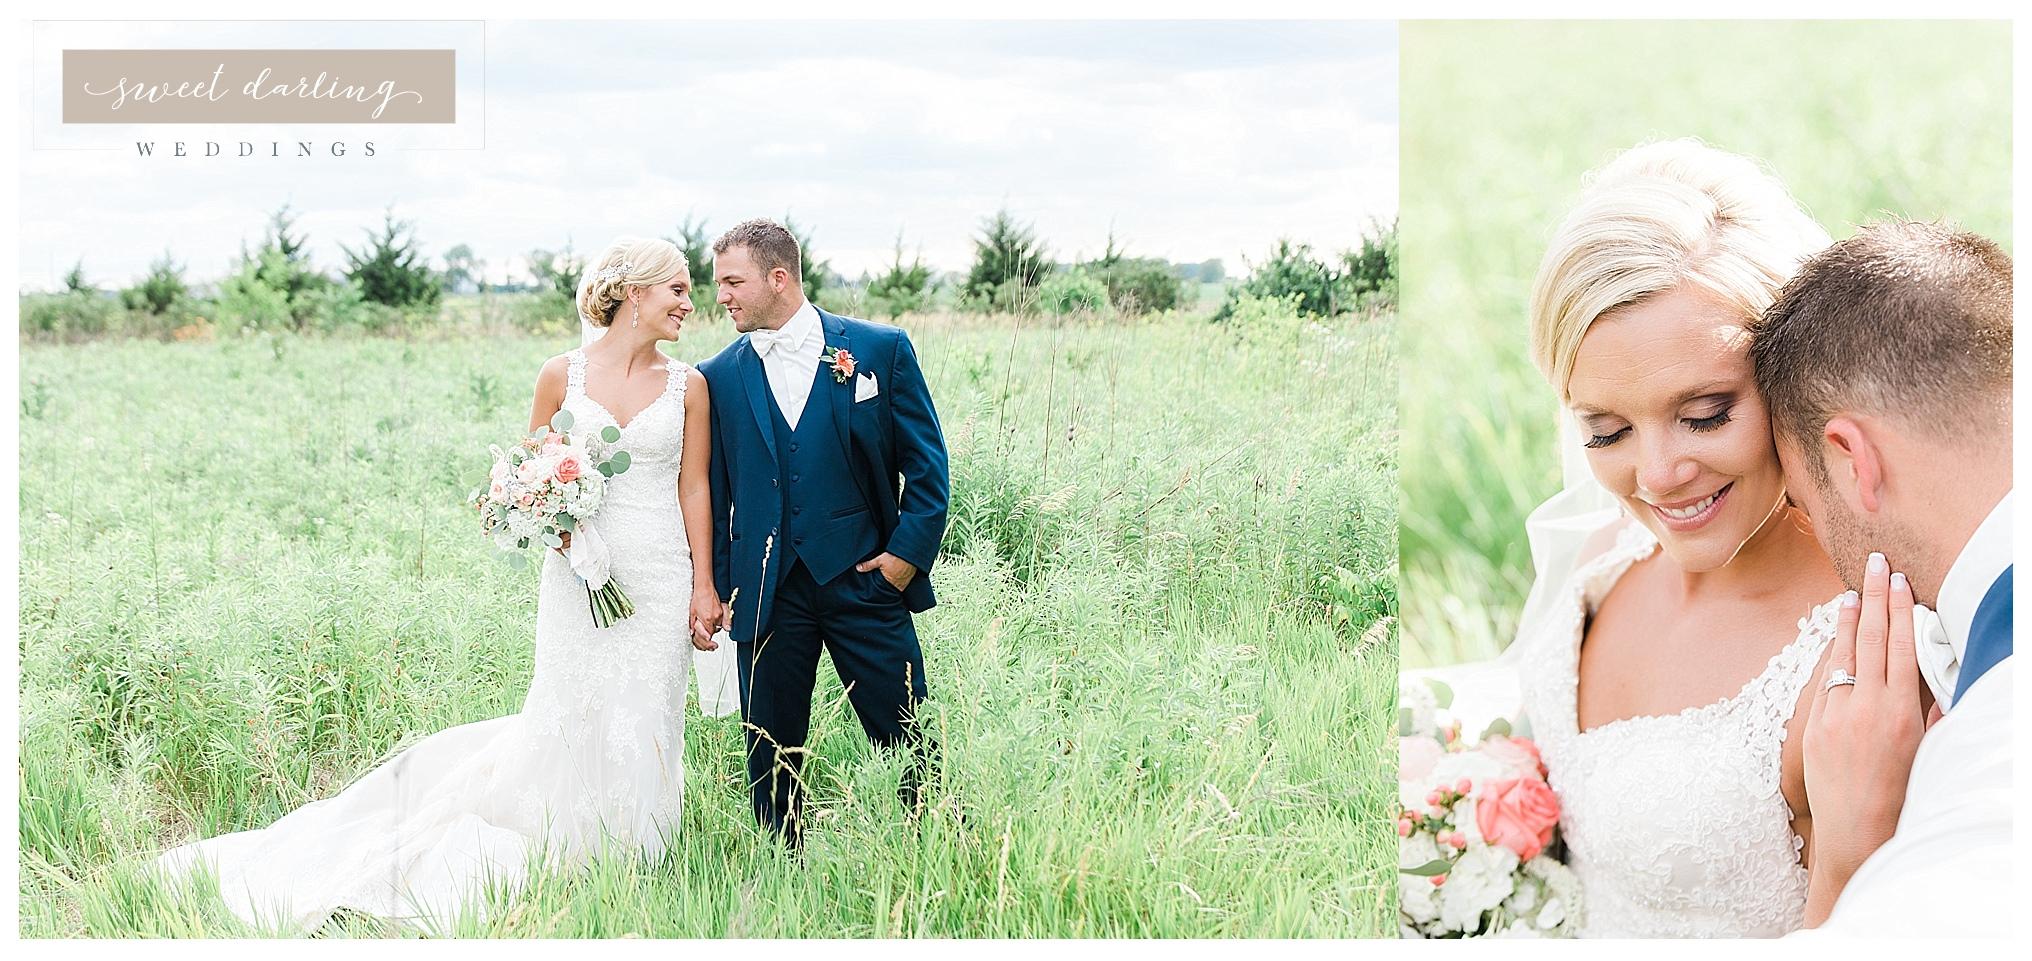 Paxton-illinois-engelbrecht-farmstead-romantic-wedding-photographer-sweet-darling-weddings_1224.jpg